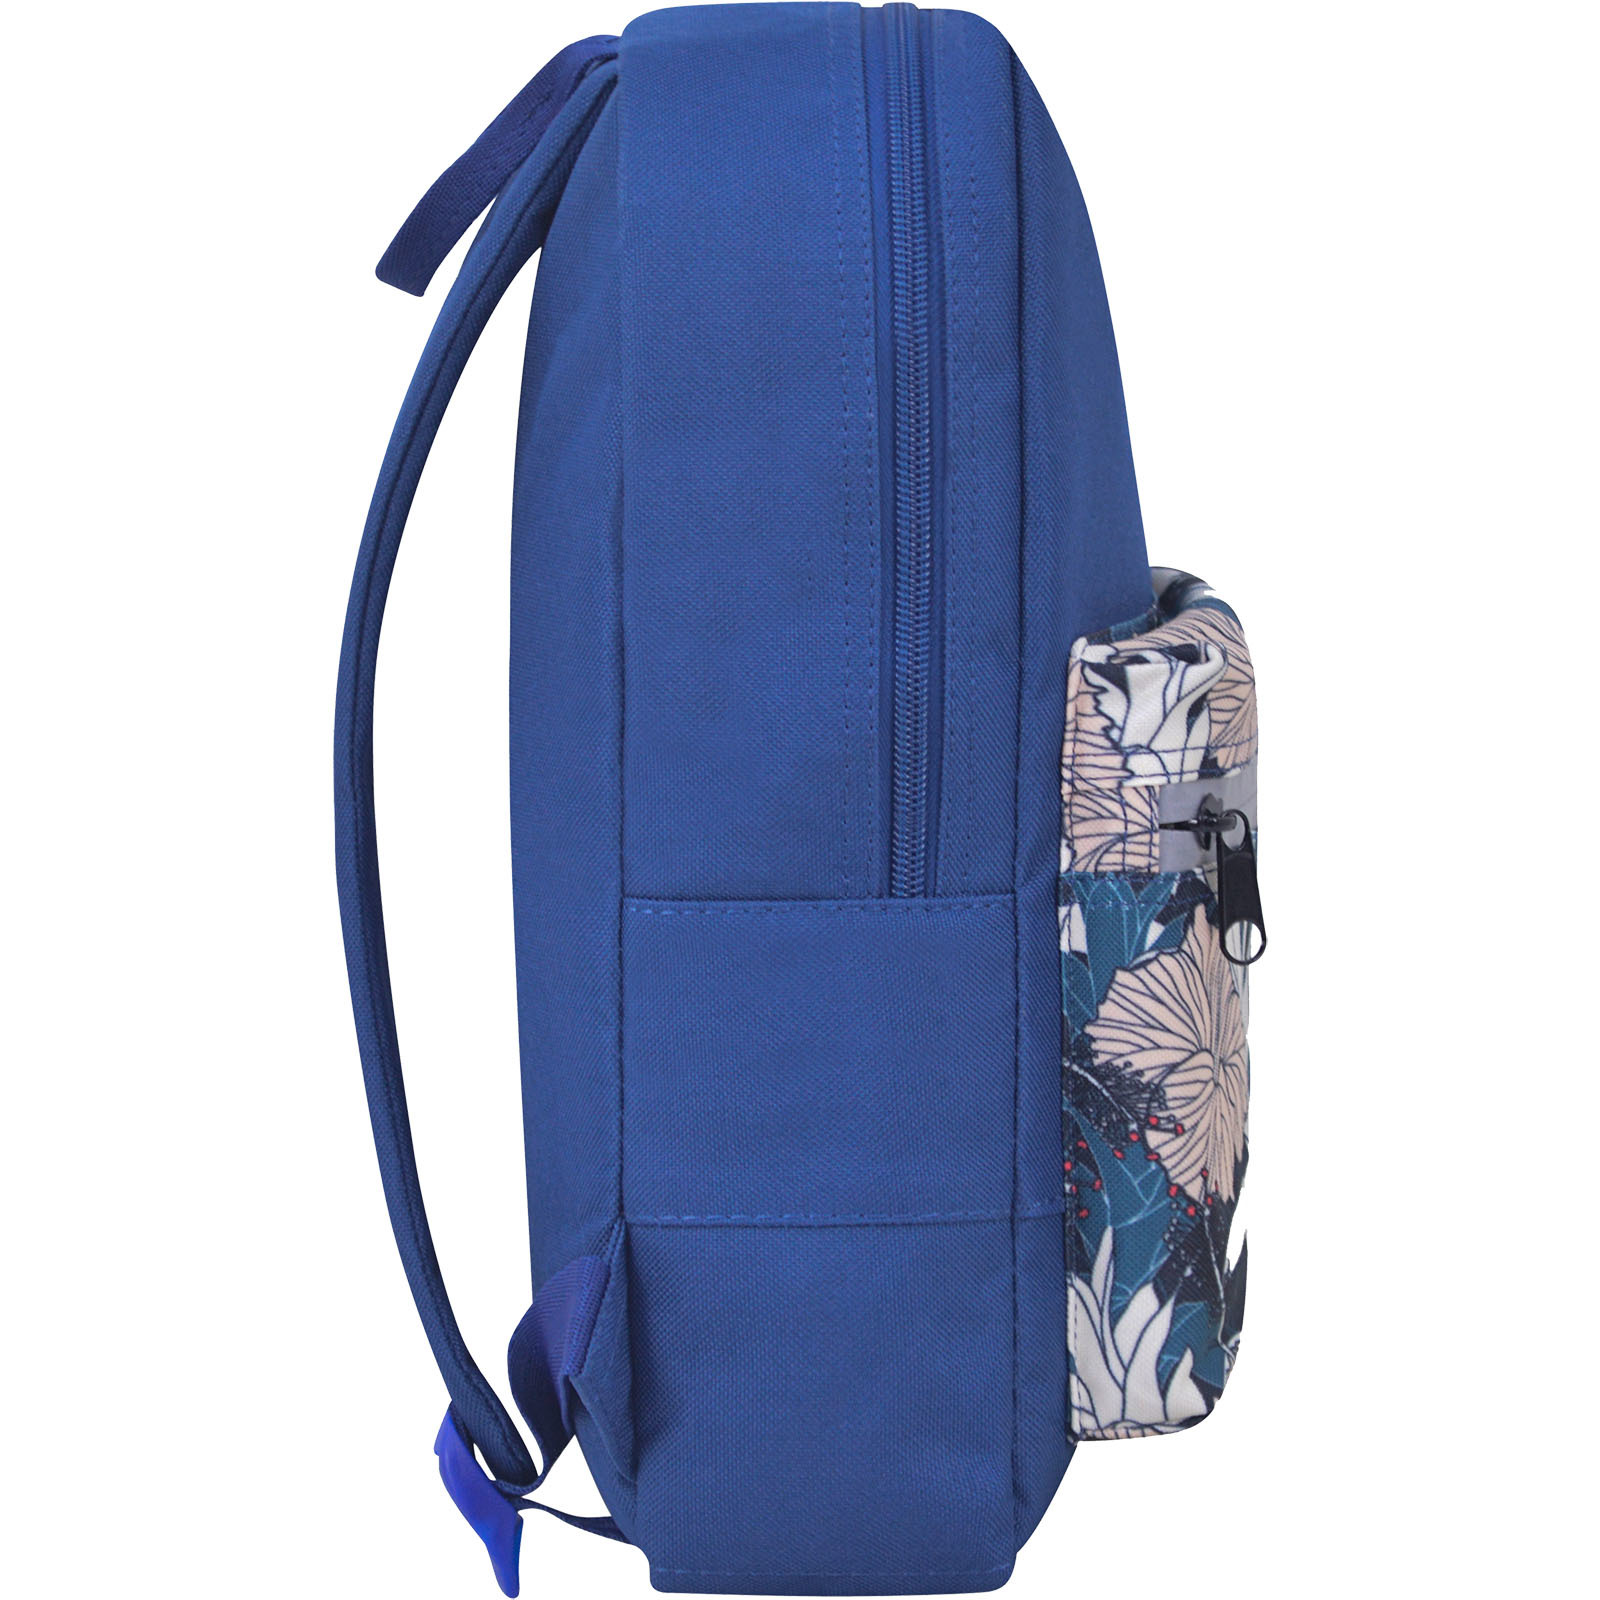 Рюкзак Bagland Молодежный mini 8 л. синий 766 (0050866)